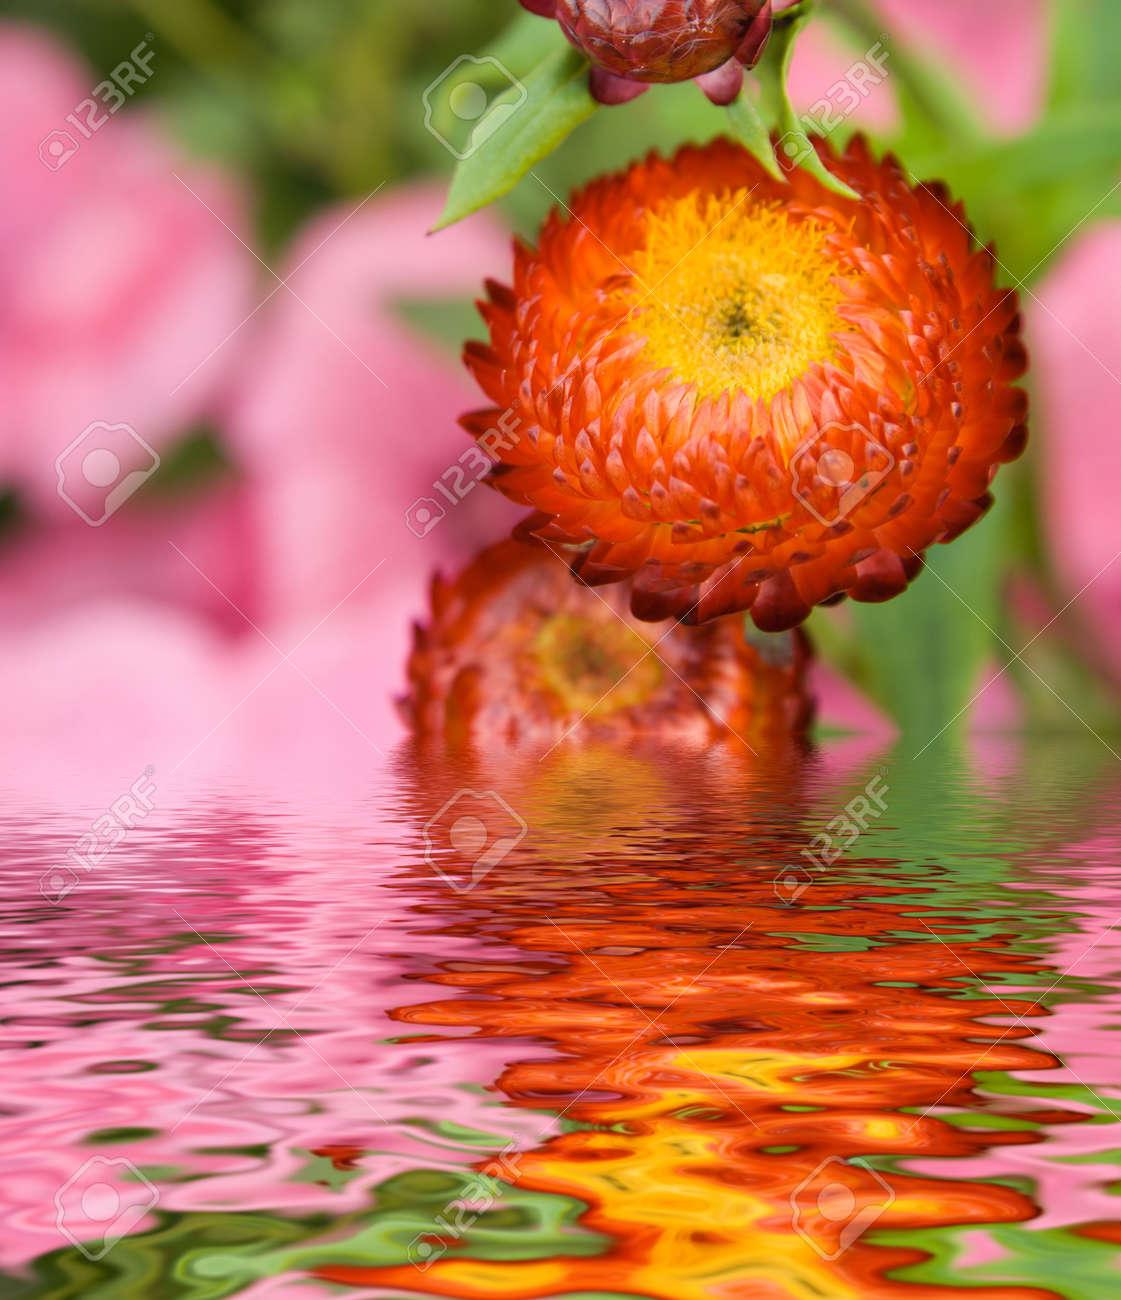 Flowers in a garden witn reflection Stock Photo - 522948